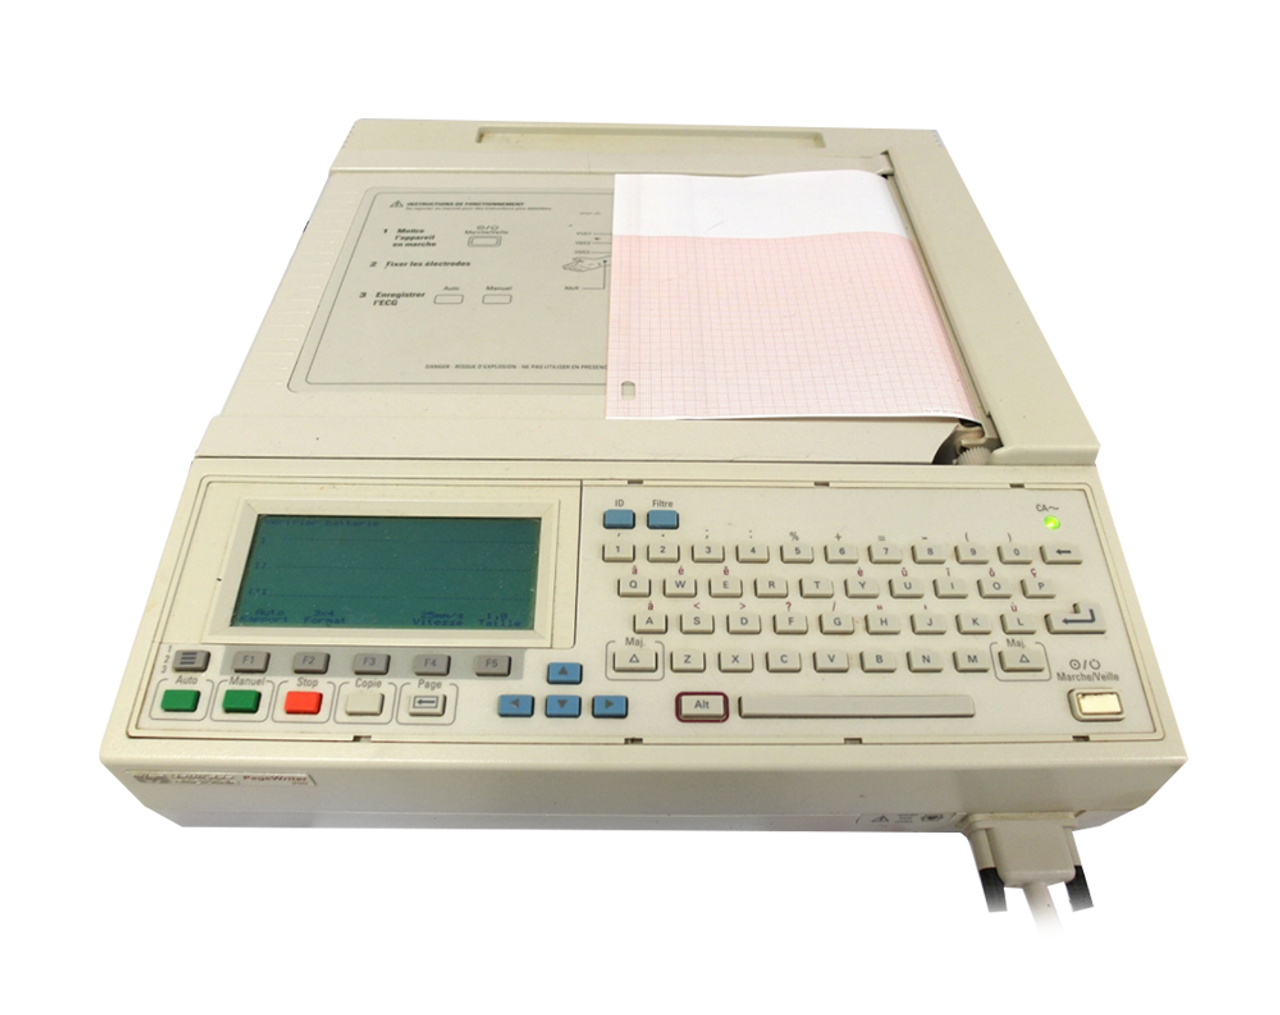 Philips HP Pagewriter 200 EKG System Rental - Jaken Medical Inc